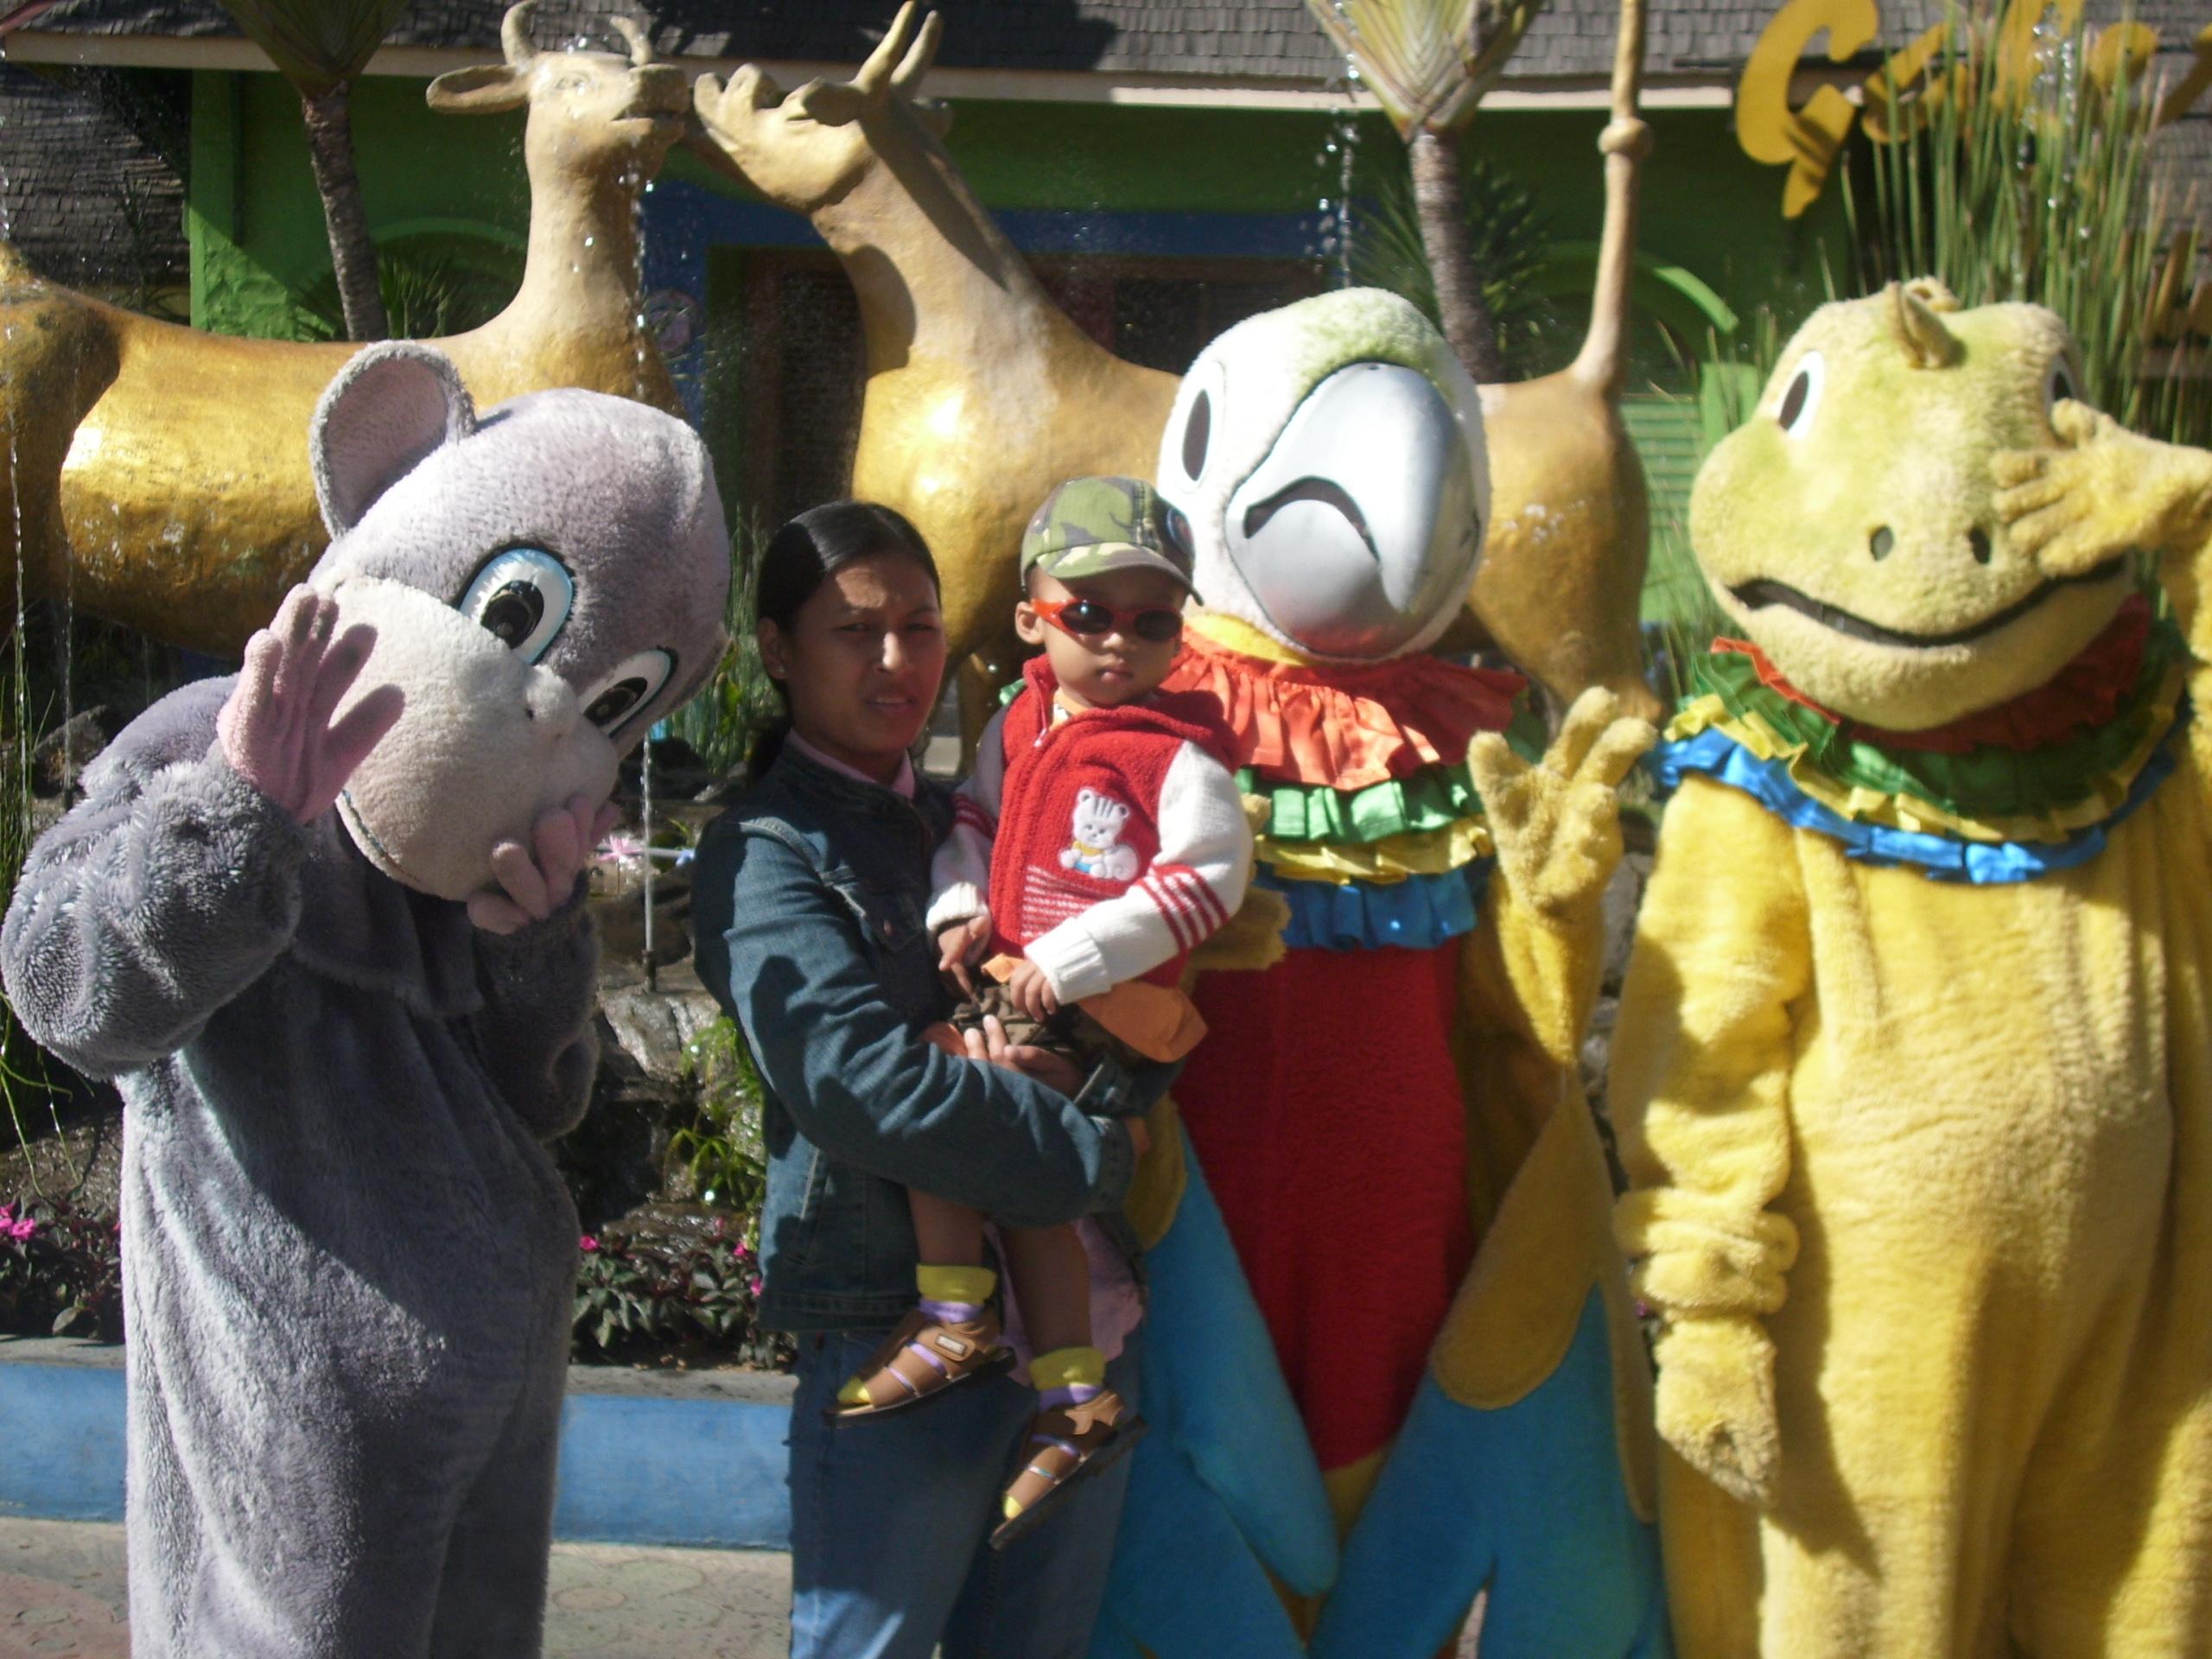 Dayu Park Tempat Rekreasi Pembelajaran Anak Didikandhika Blog Sragen Berwisata